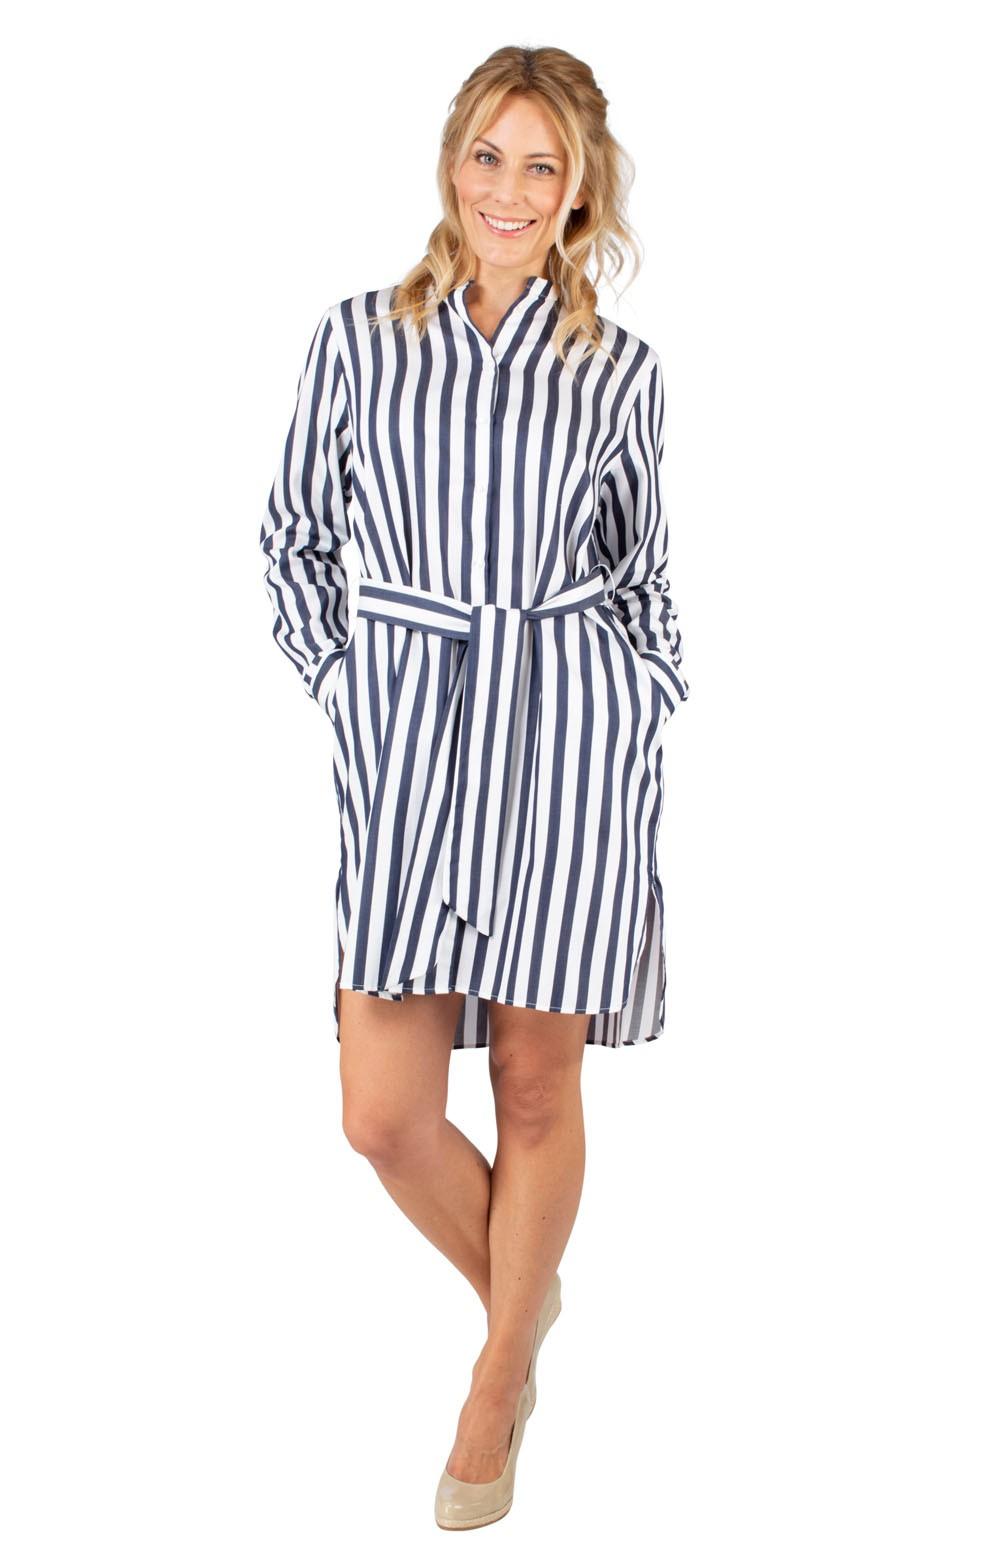 2e81871504a634 Ladies Seidensticker Stripe Dress - House of Bruar